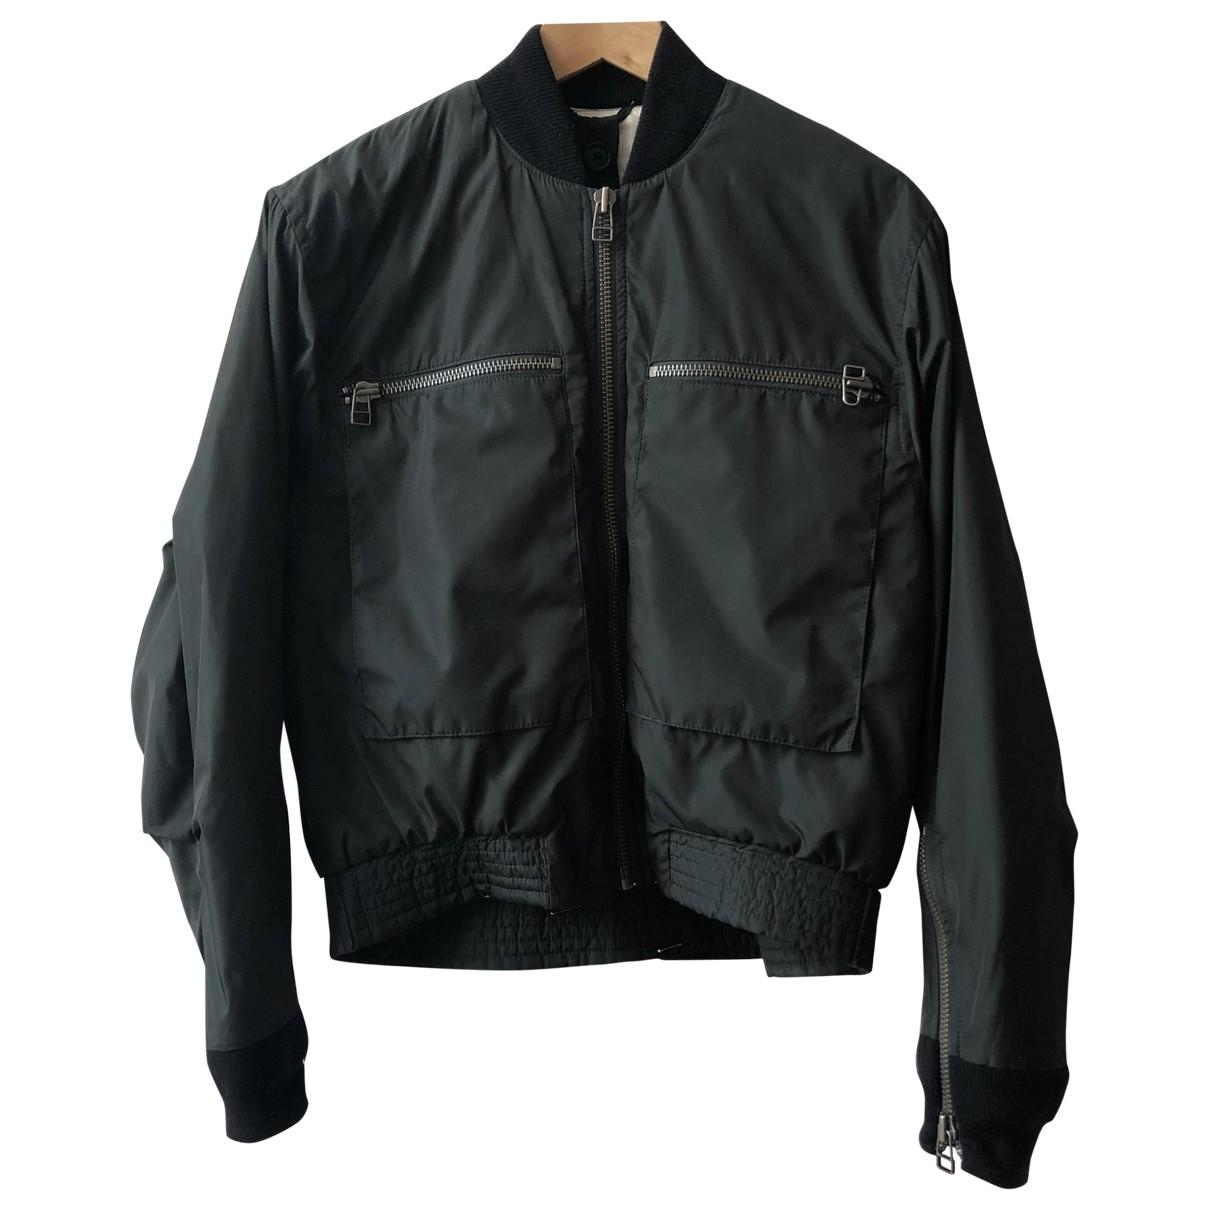 H&m Studio \N Green jacket for Women 36 FR